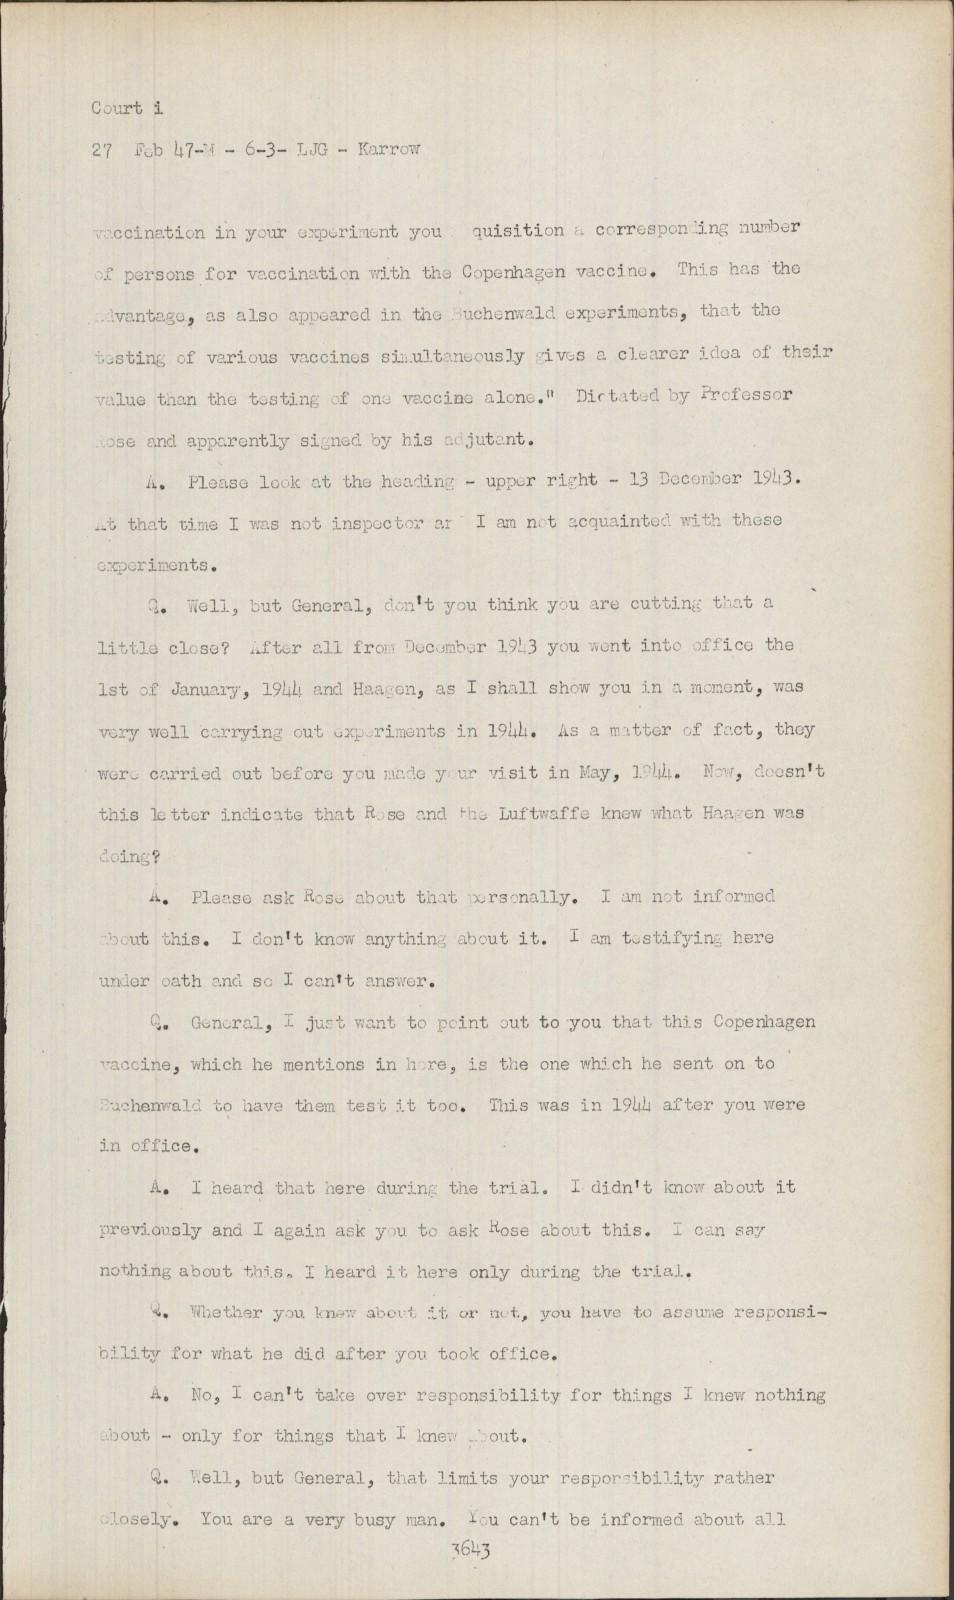 Nuremberg Transcript Viewer For Nmt 1 Medical Case Rose Diagram1 Page 3643